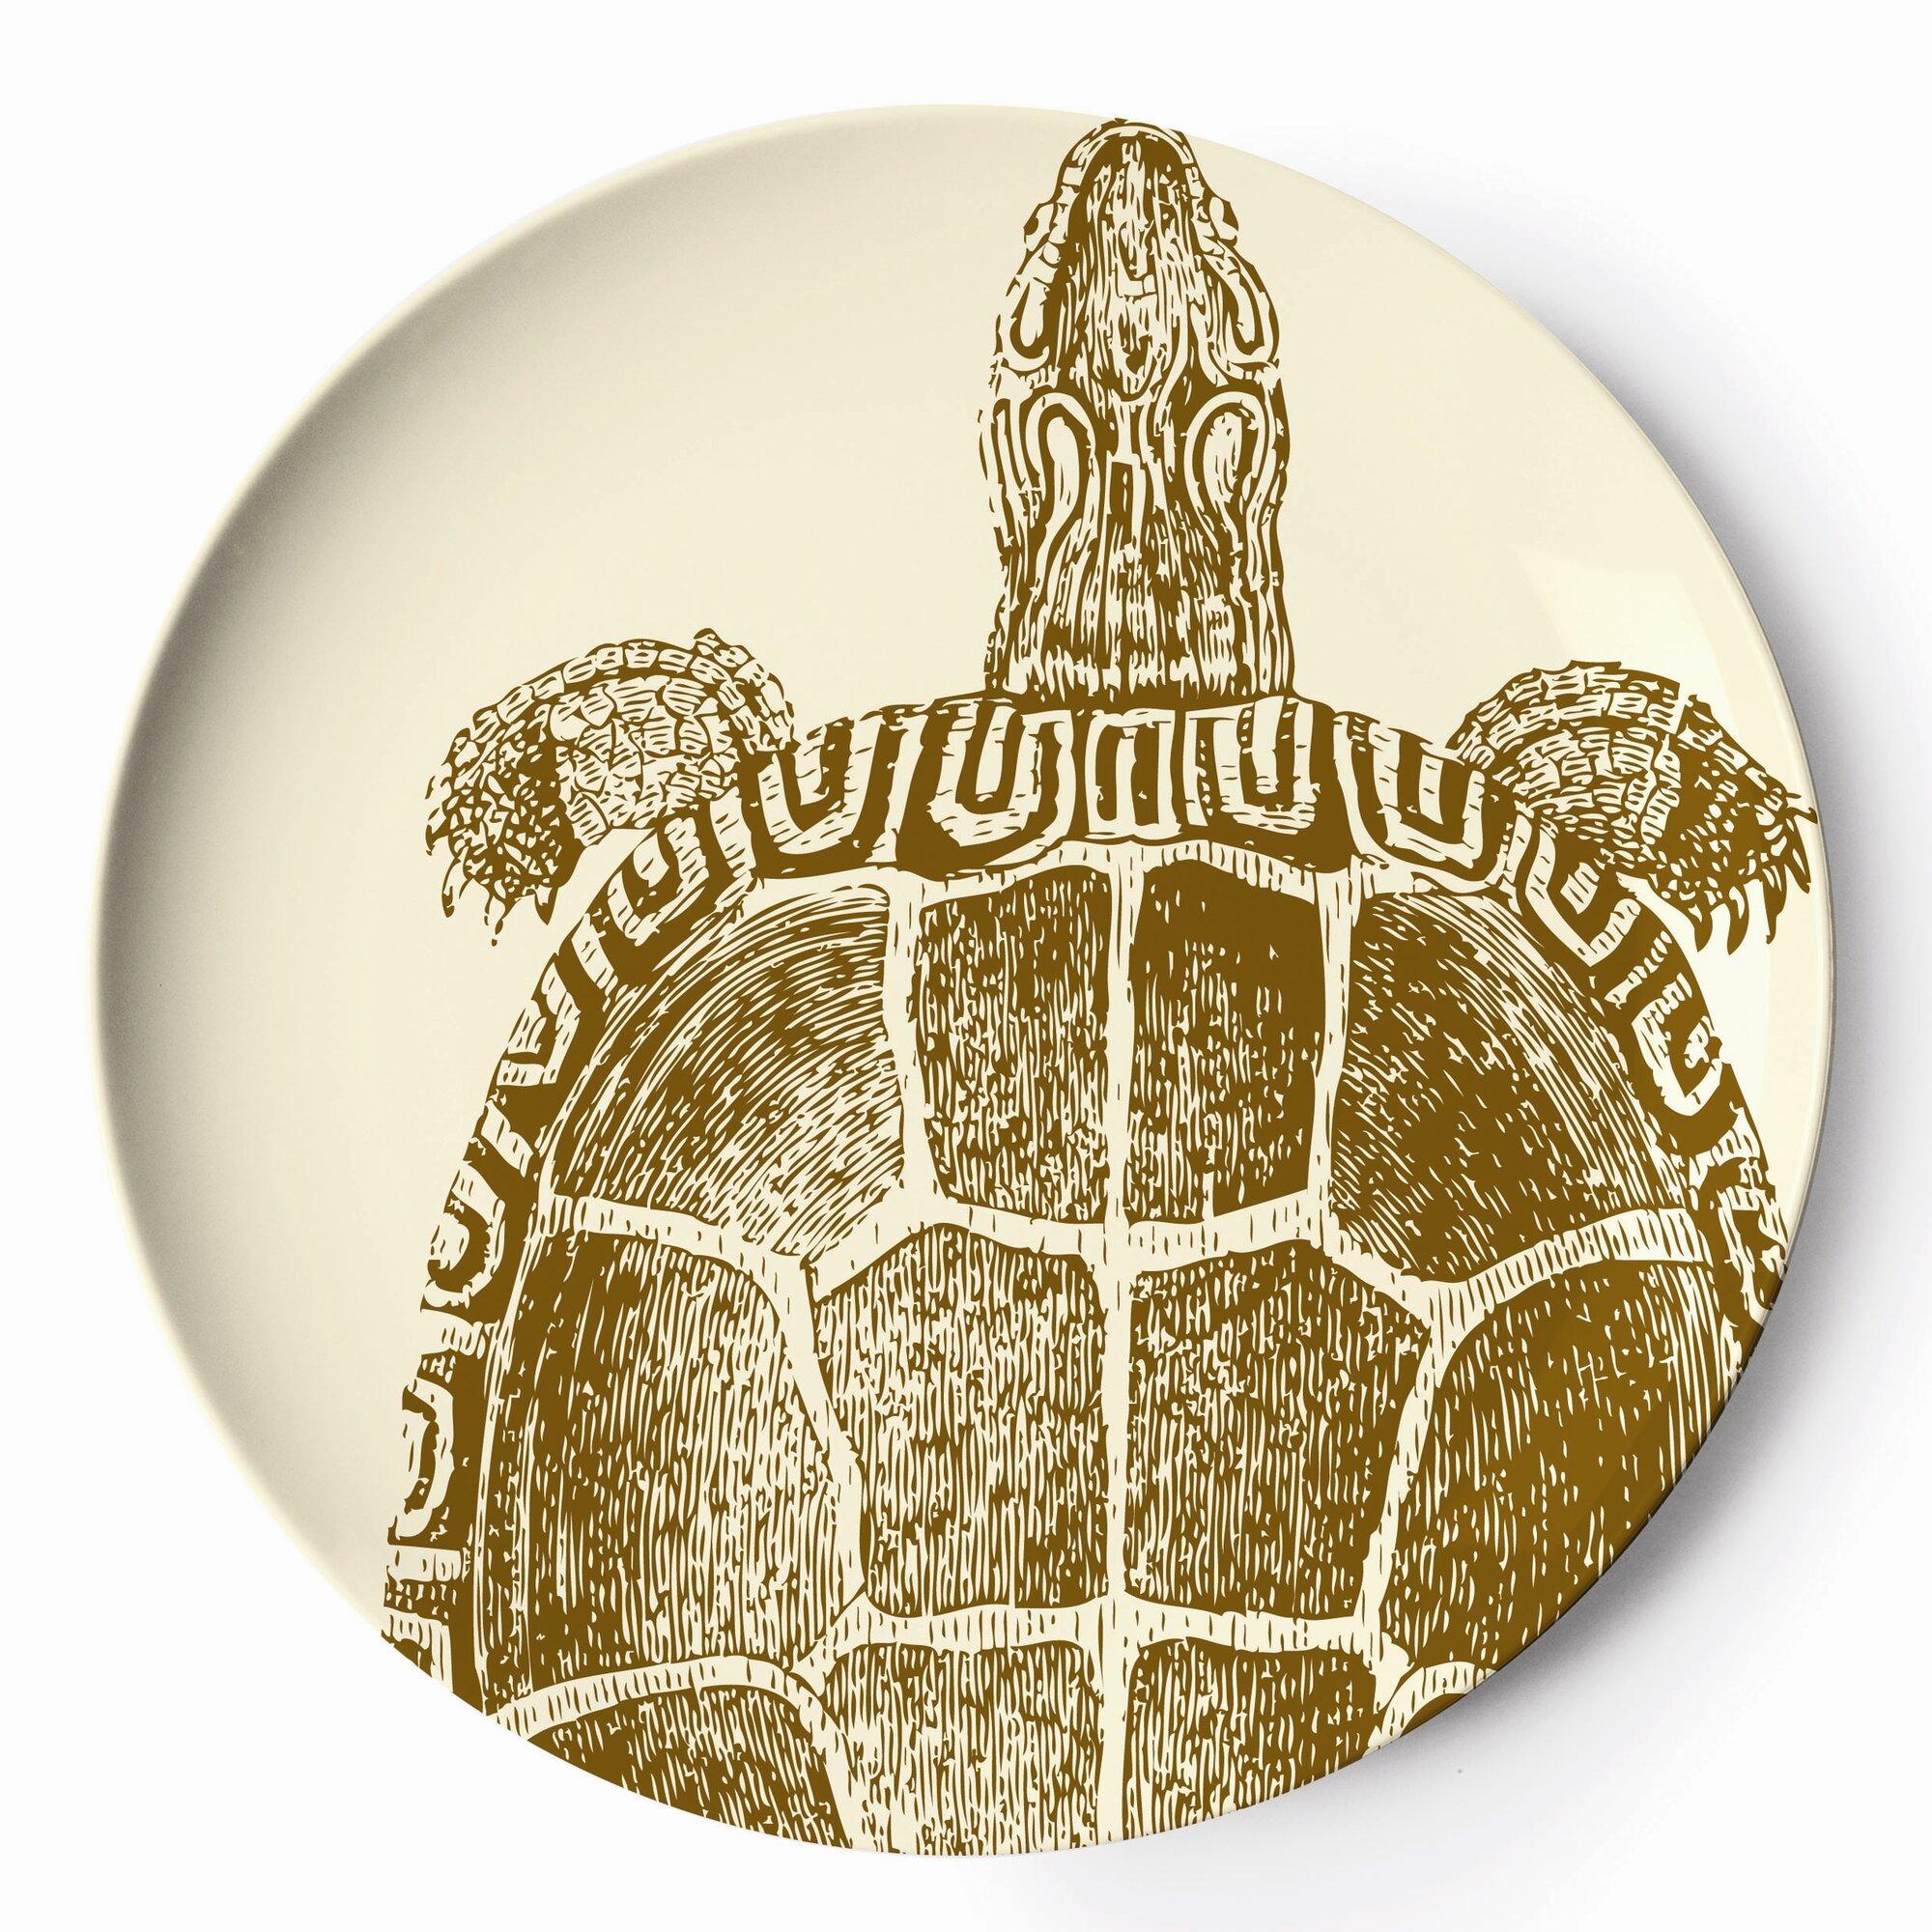 thomas paul sea life melamine platter  reviews  wayfair - sea life melamine platter